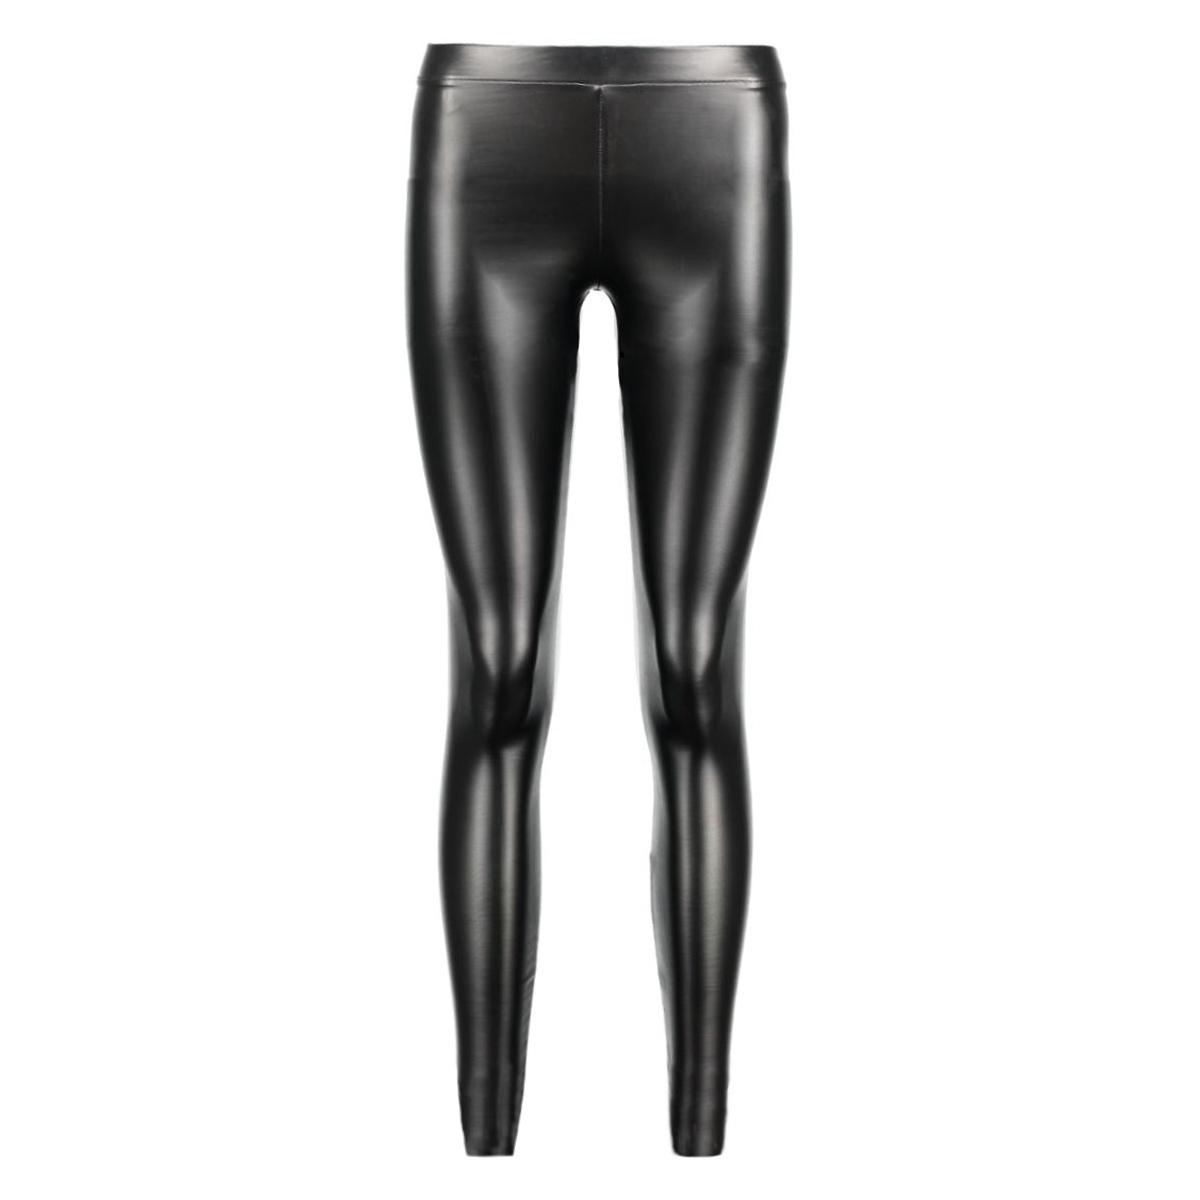 jdylaila black leggings 5 jrs 15123666 jacqueline de yong legging black